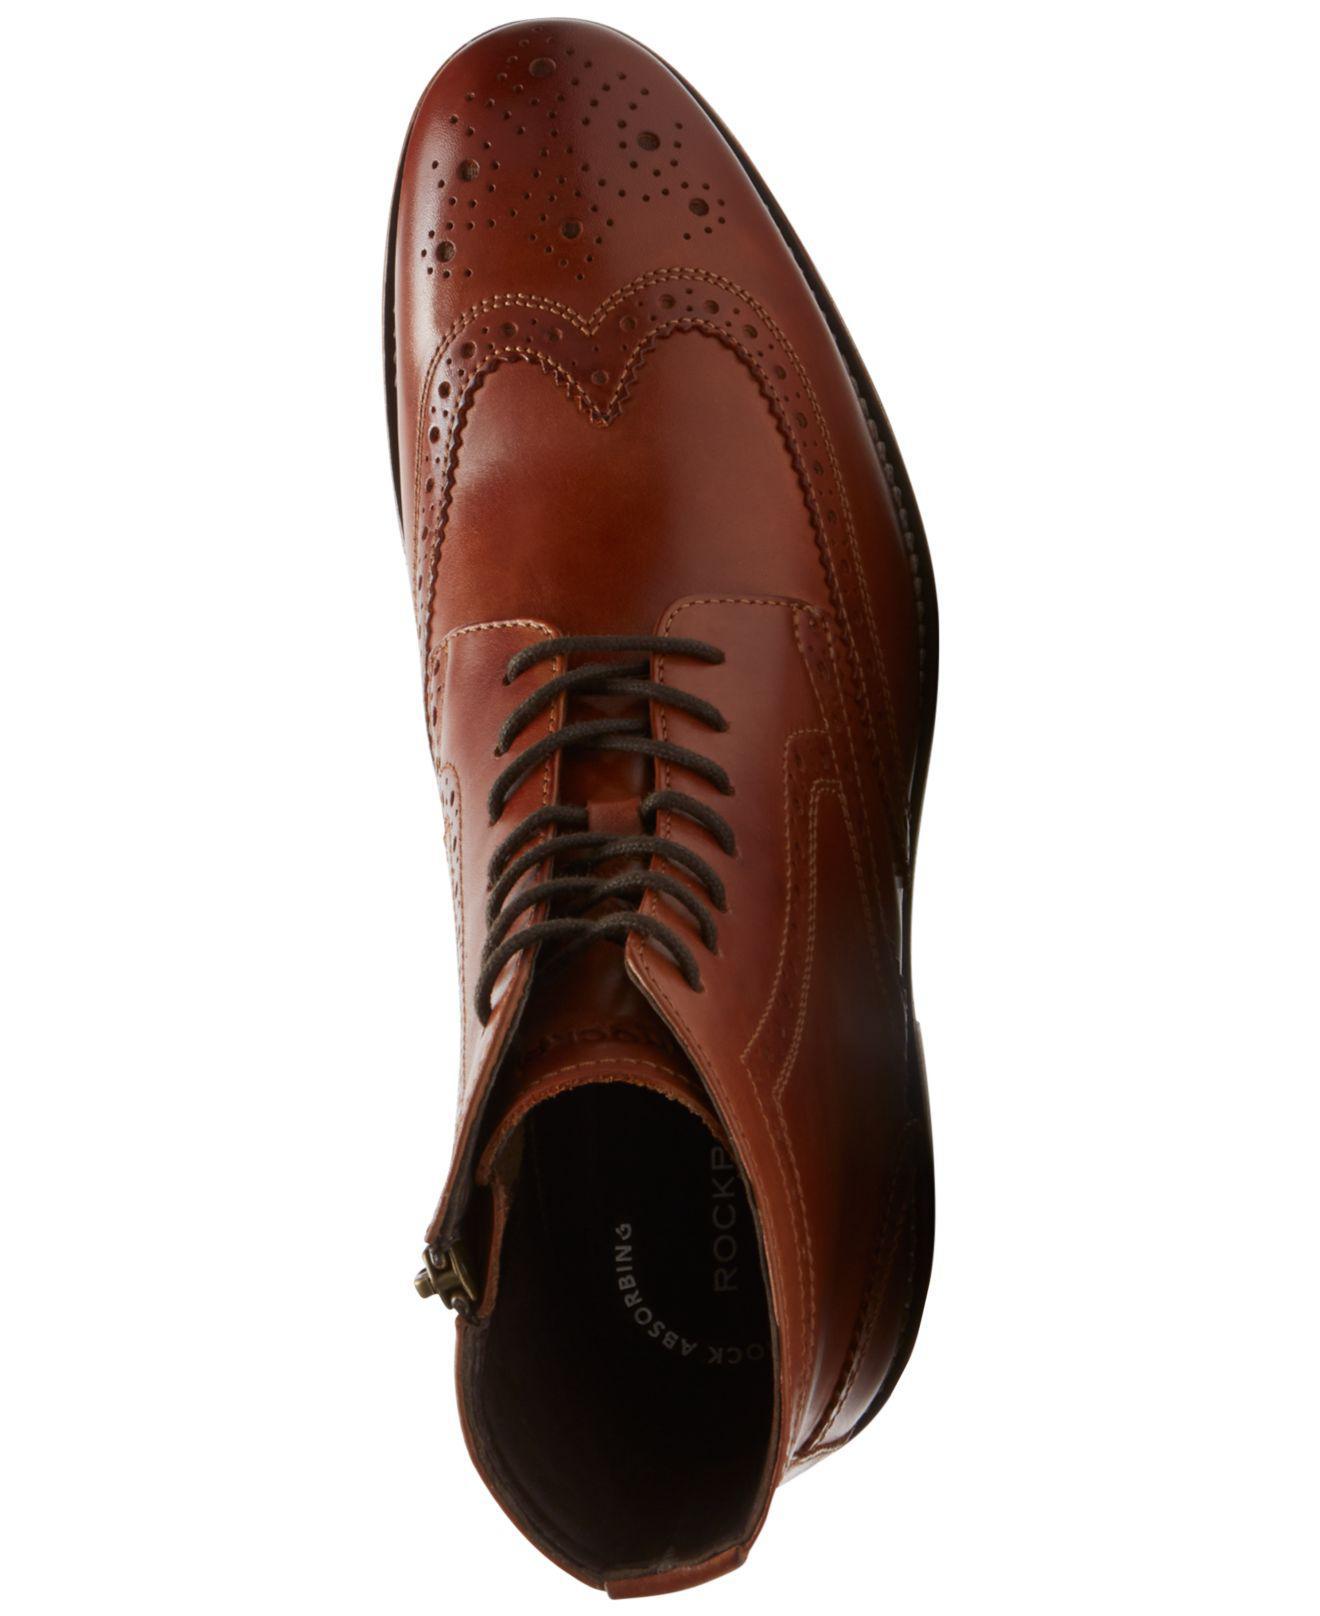 cbd587046 Rockport Men's Wyat Wingtip Boots in Brown for Men - Lyst